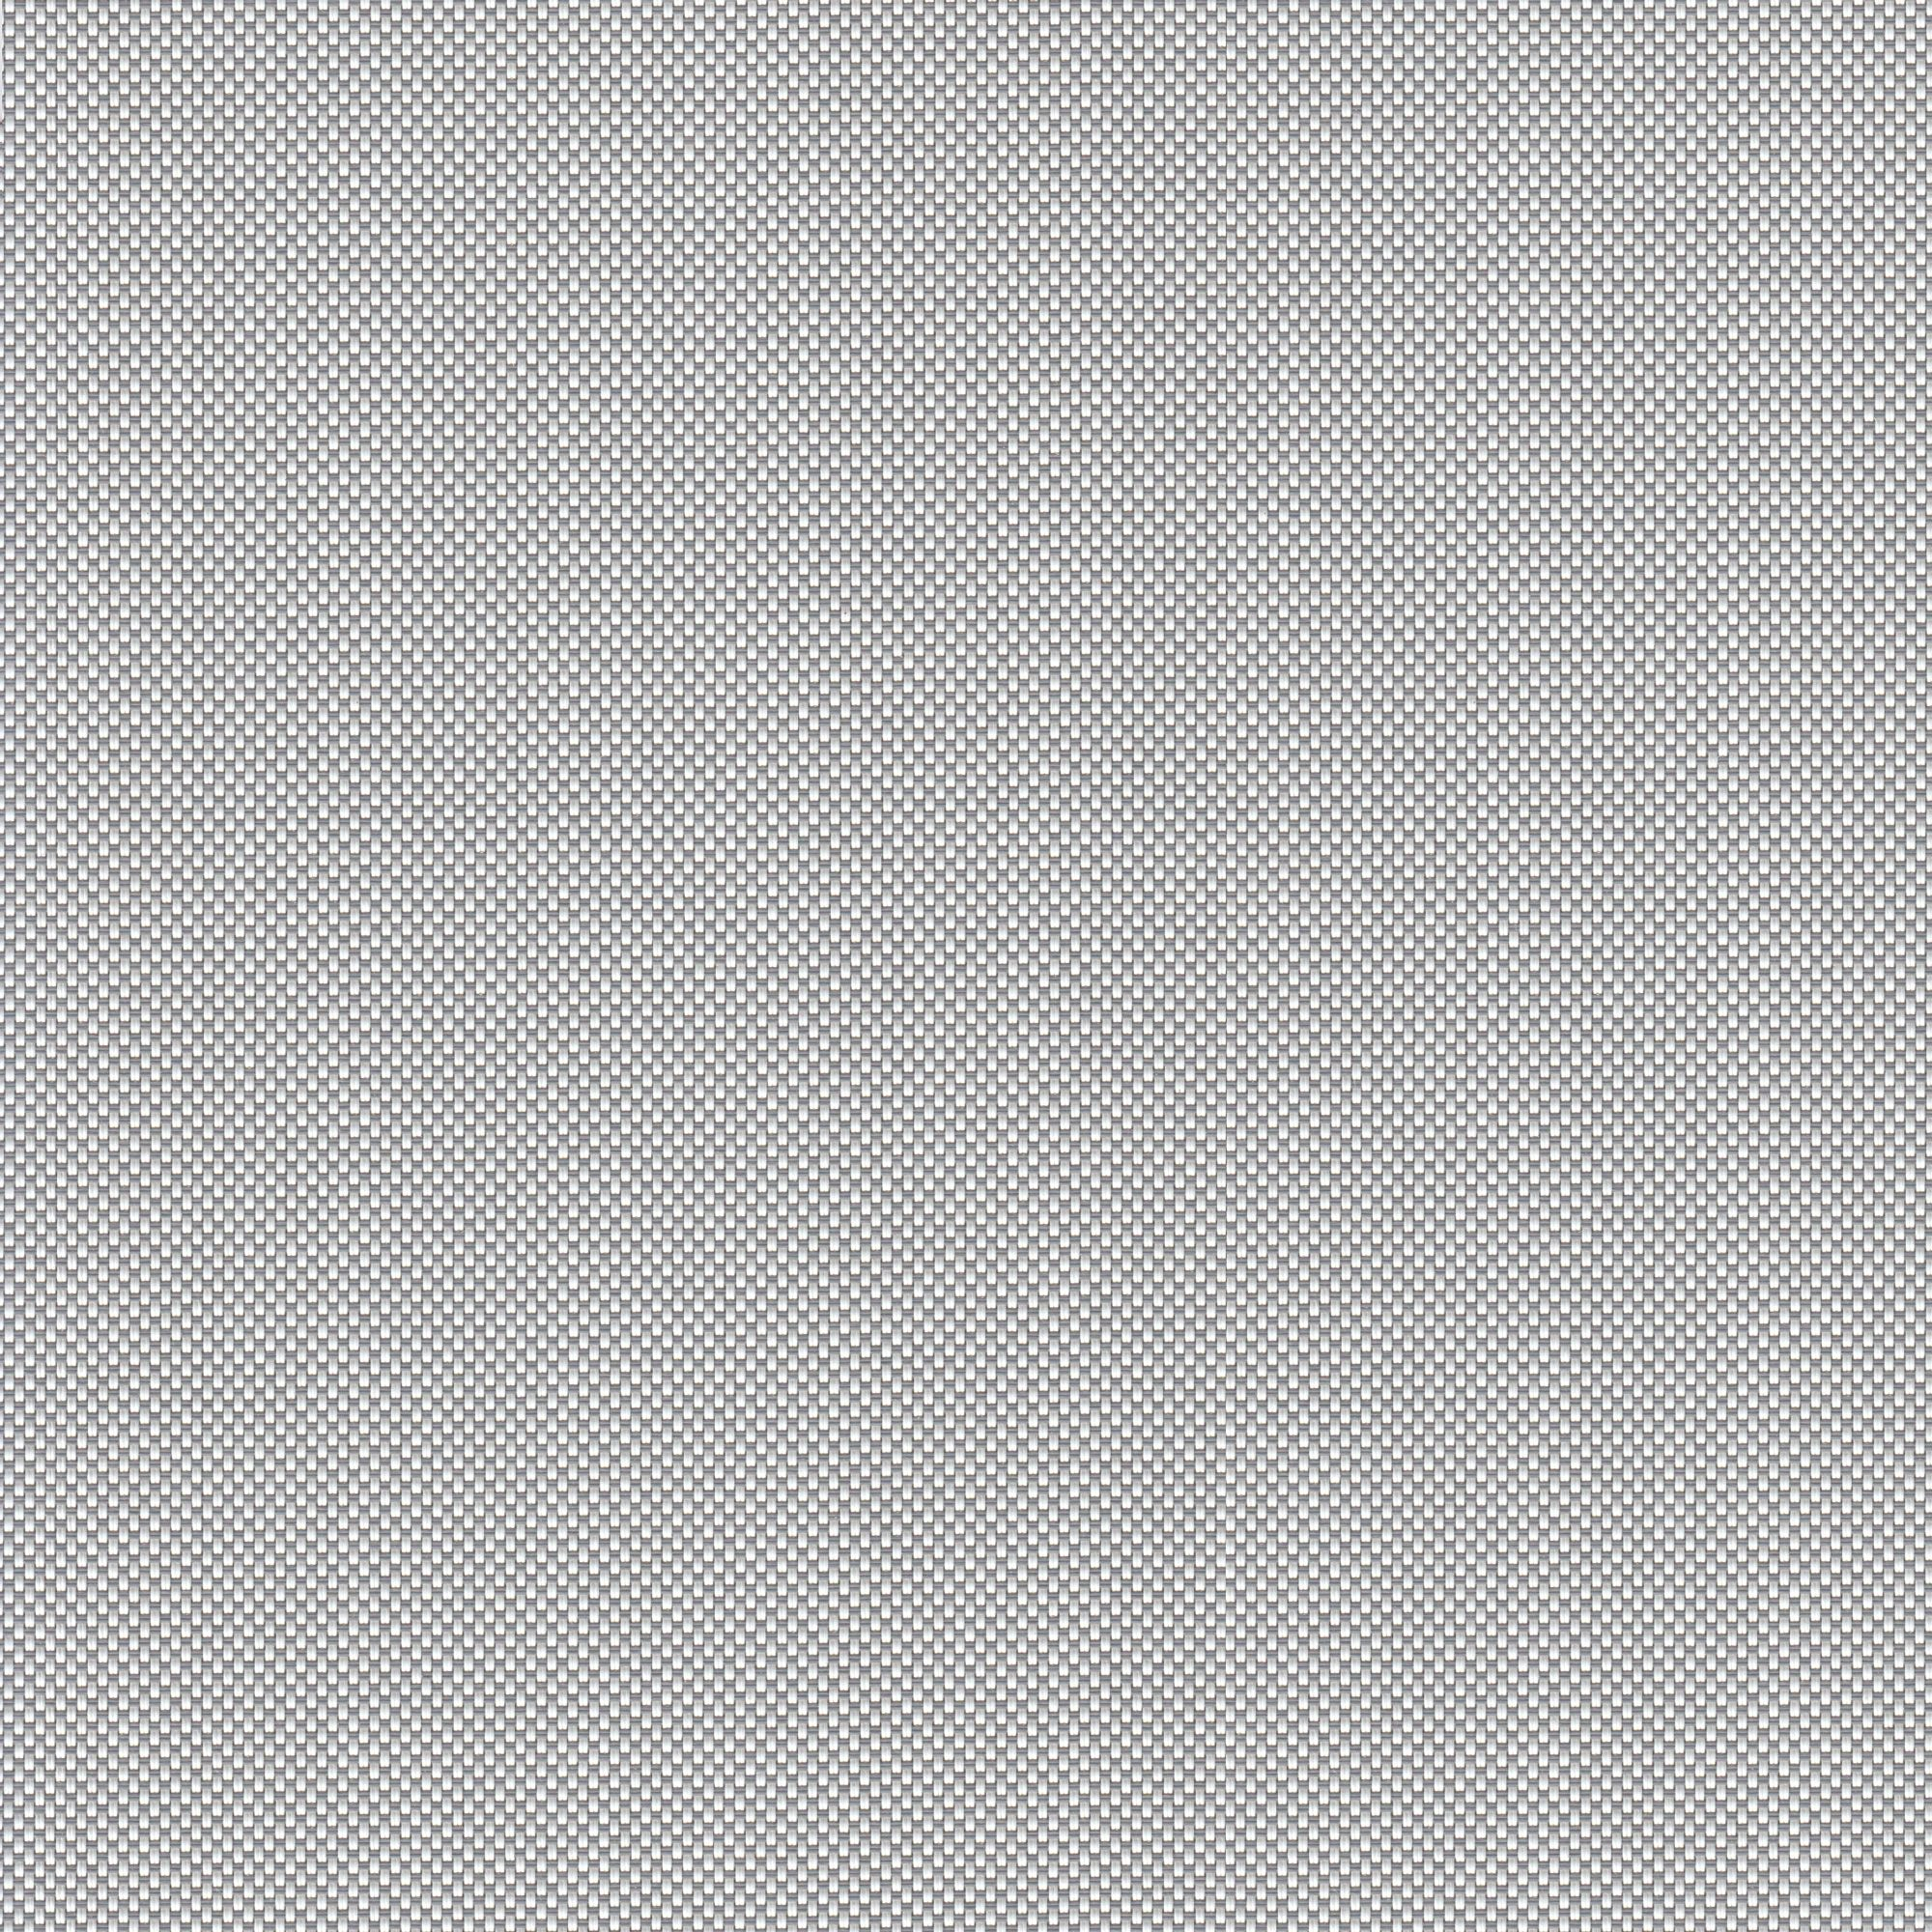 Nordic Screen BW White-Gray